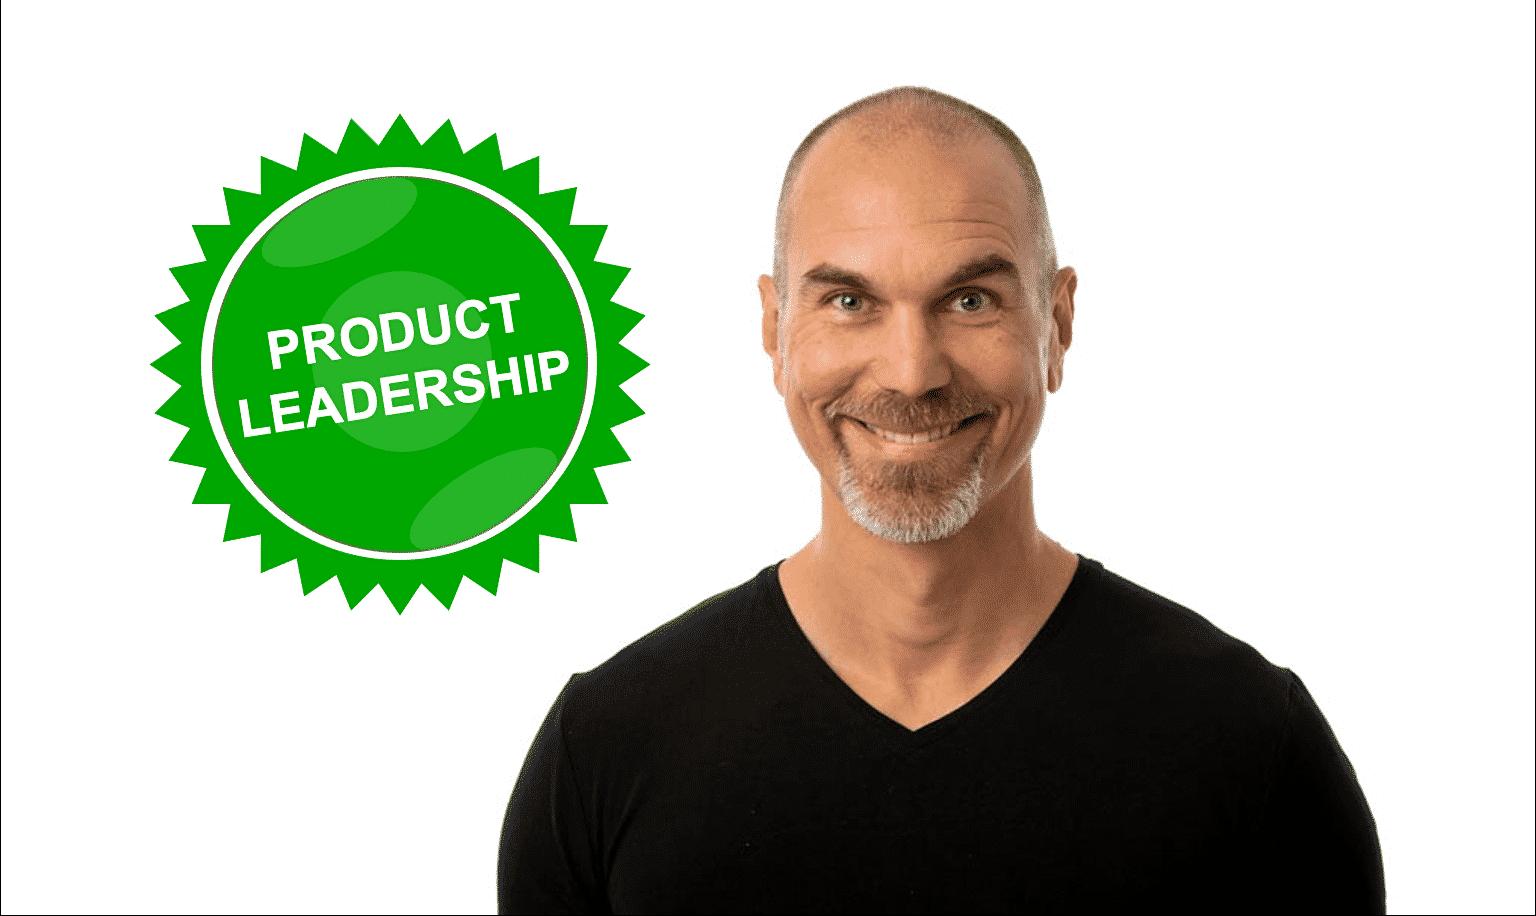 Roman's Product Leadership Workshop